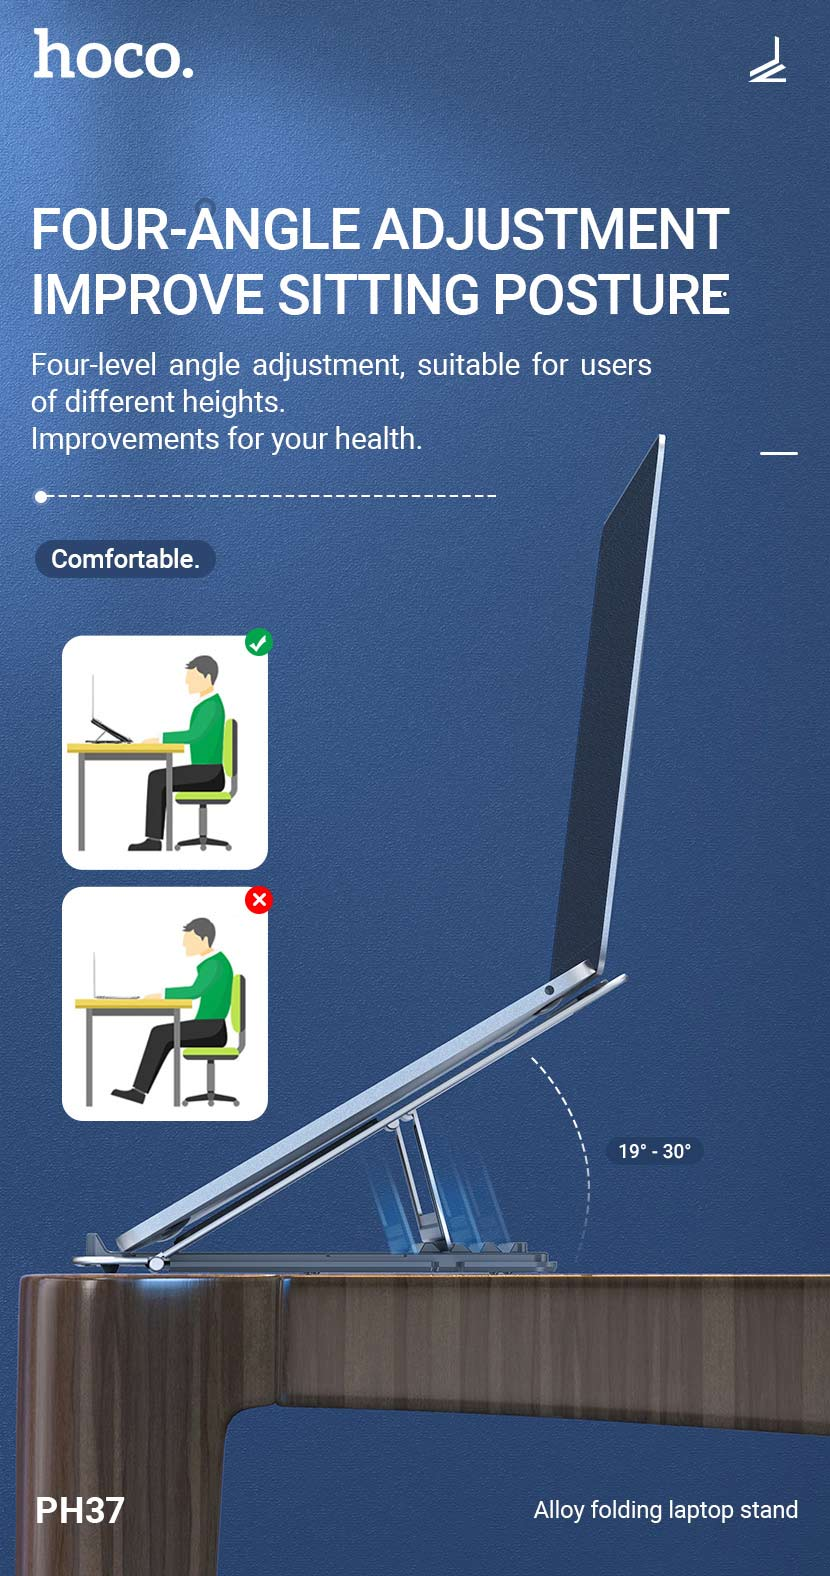 hoco news ph37 excellent aluminum alloy folding laptop stand adjustment en